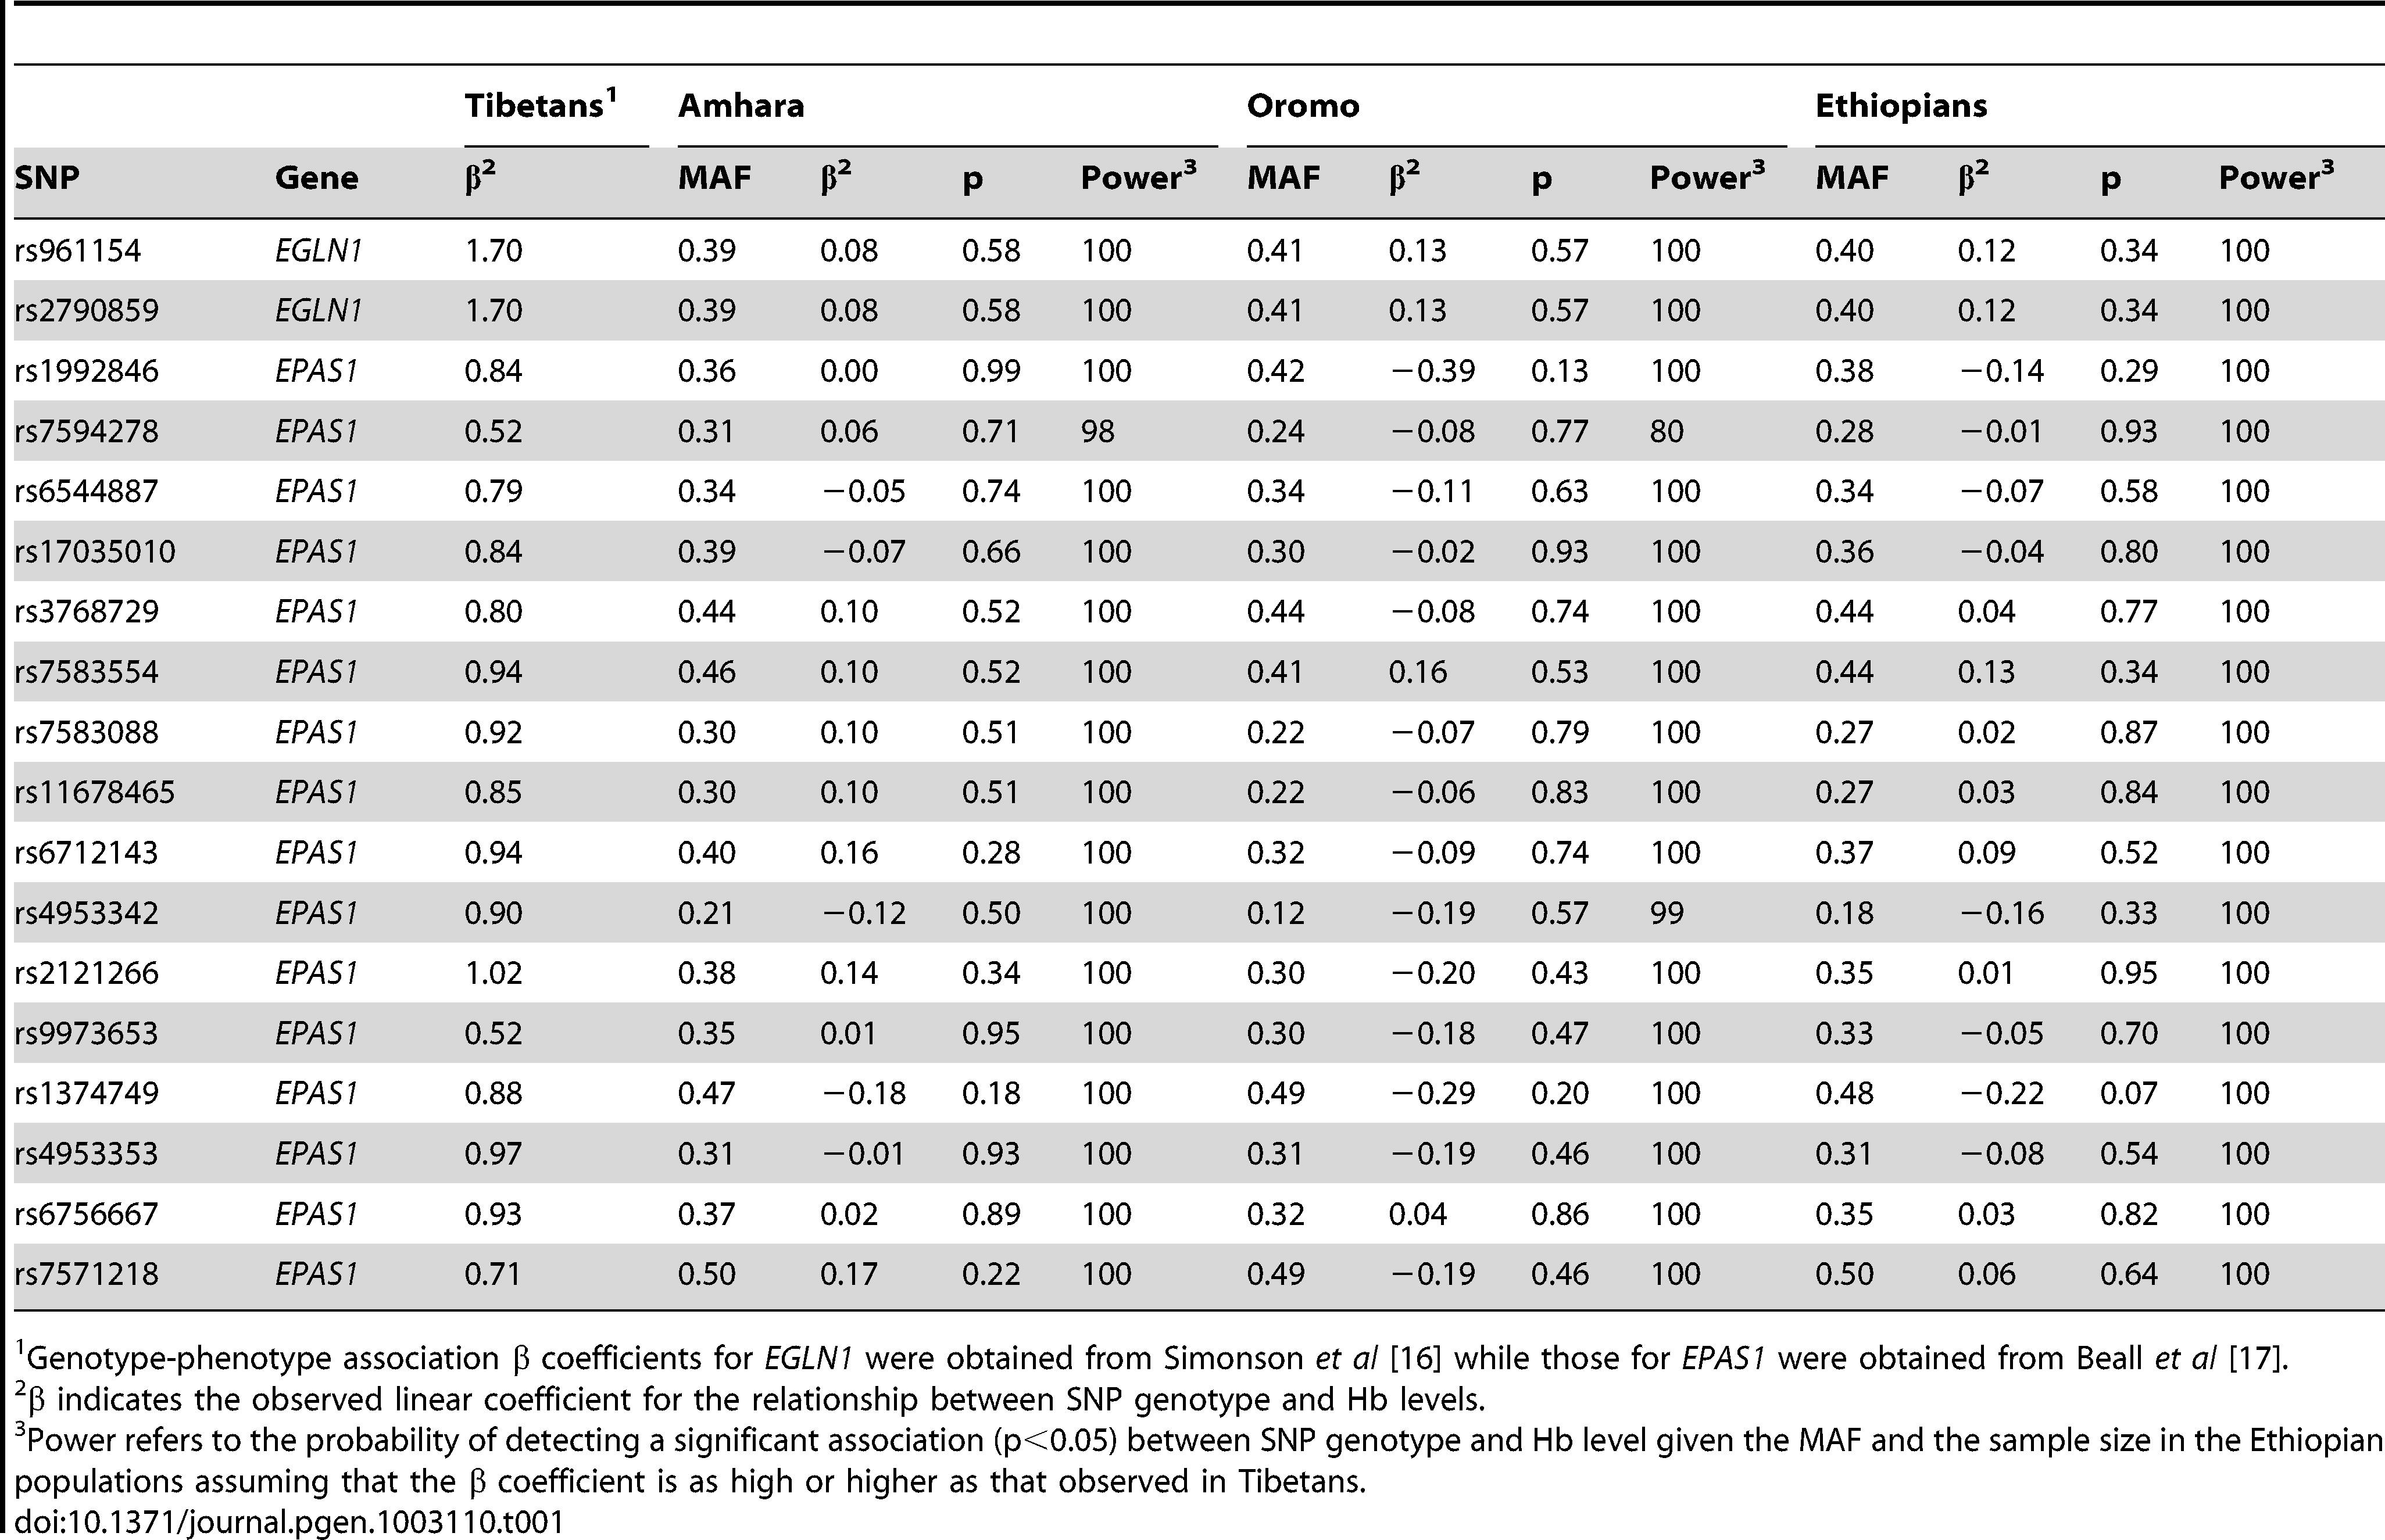 Association test of Tibetan <i>EGLN1</i> and <i>EPAS1</i> SNPs within Amhara, Oromo, and combined Ethiopians.